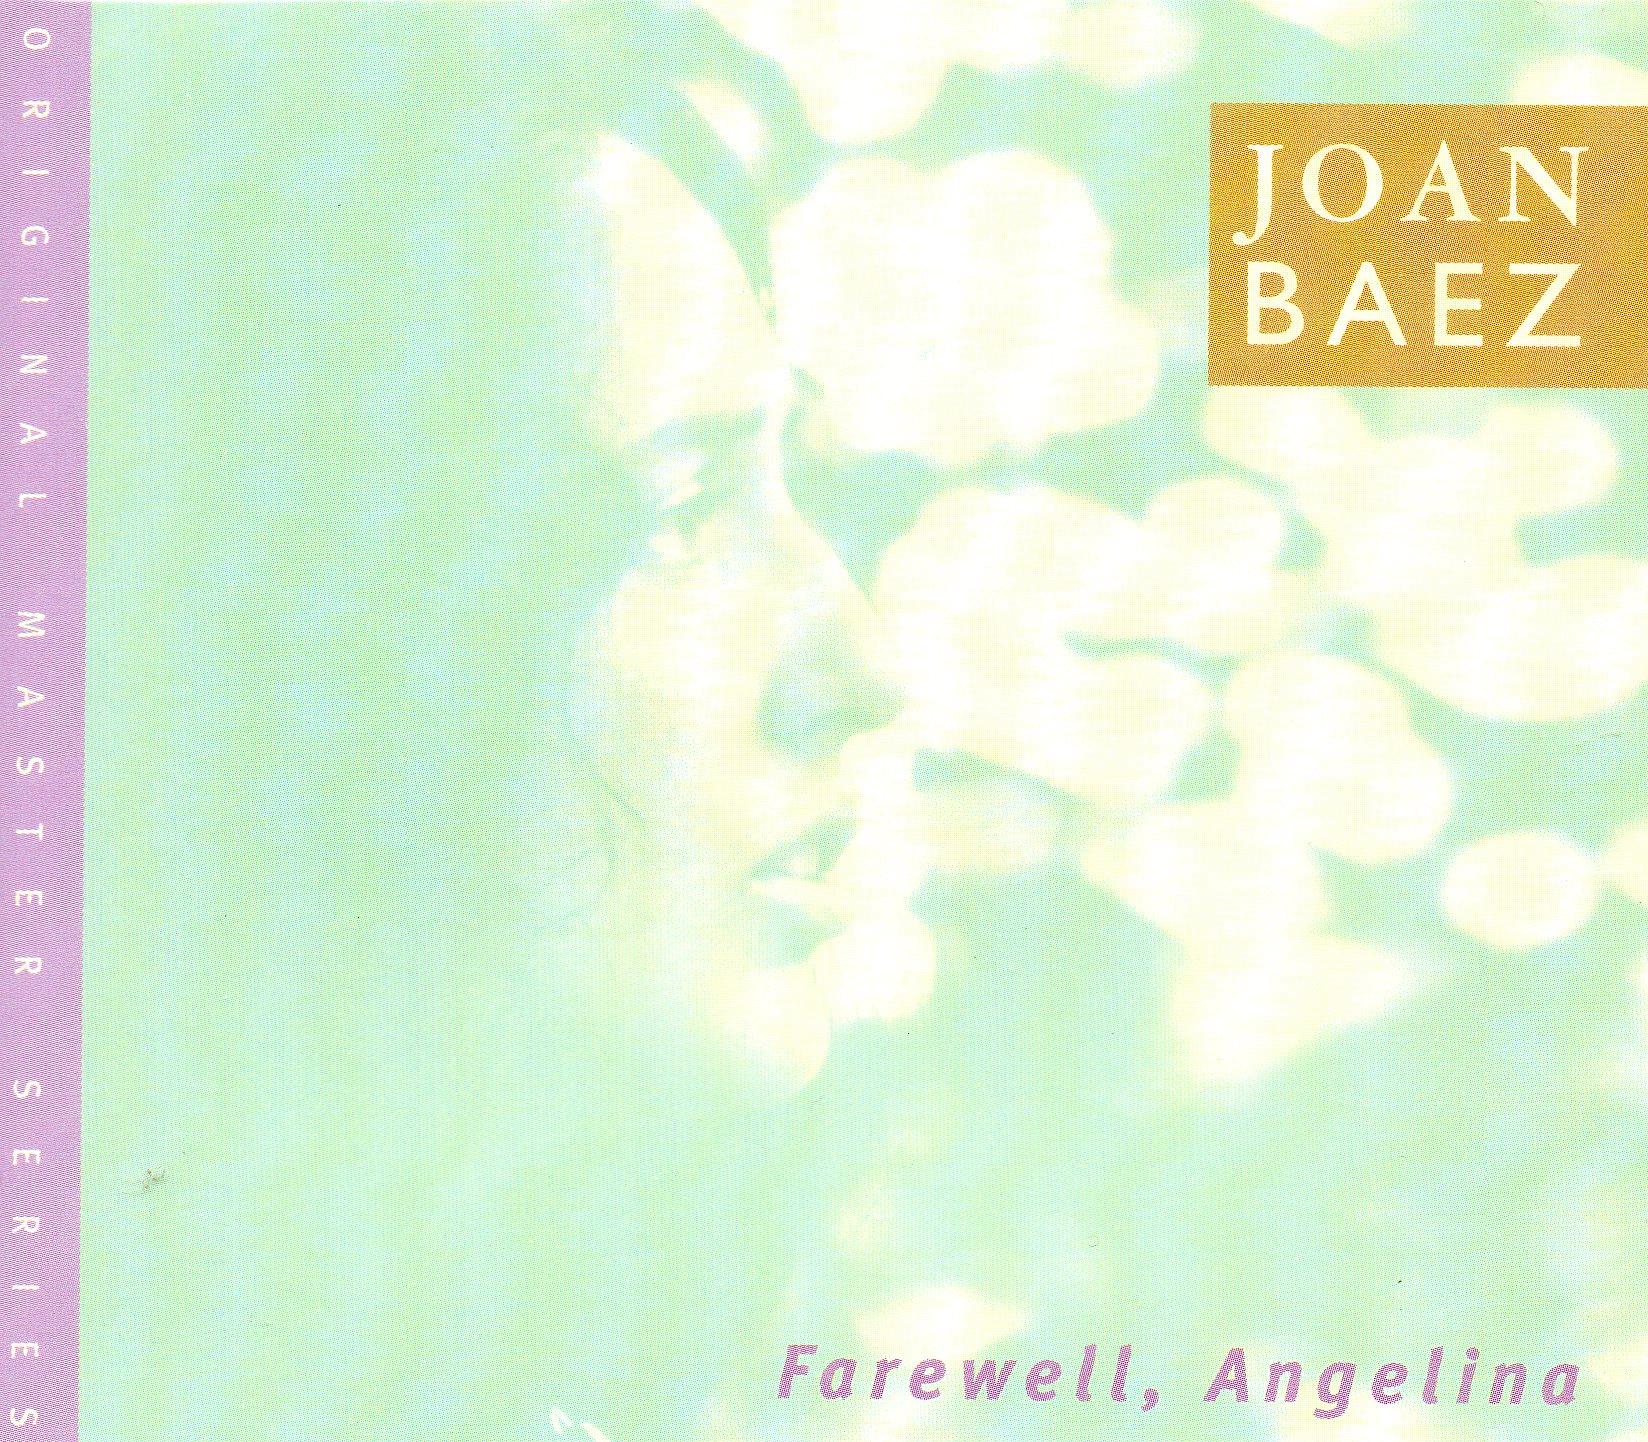 JOAN BAEZ - FAREWELL, ANGELINA [USA]